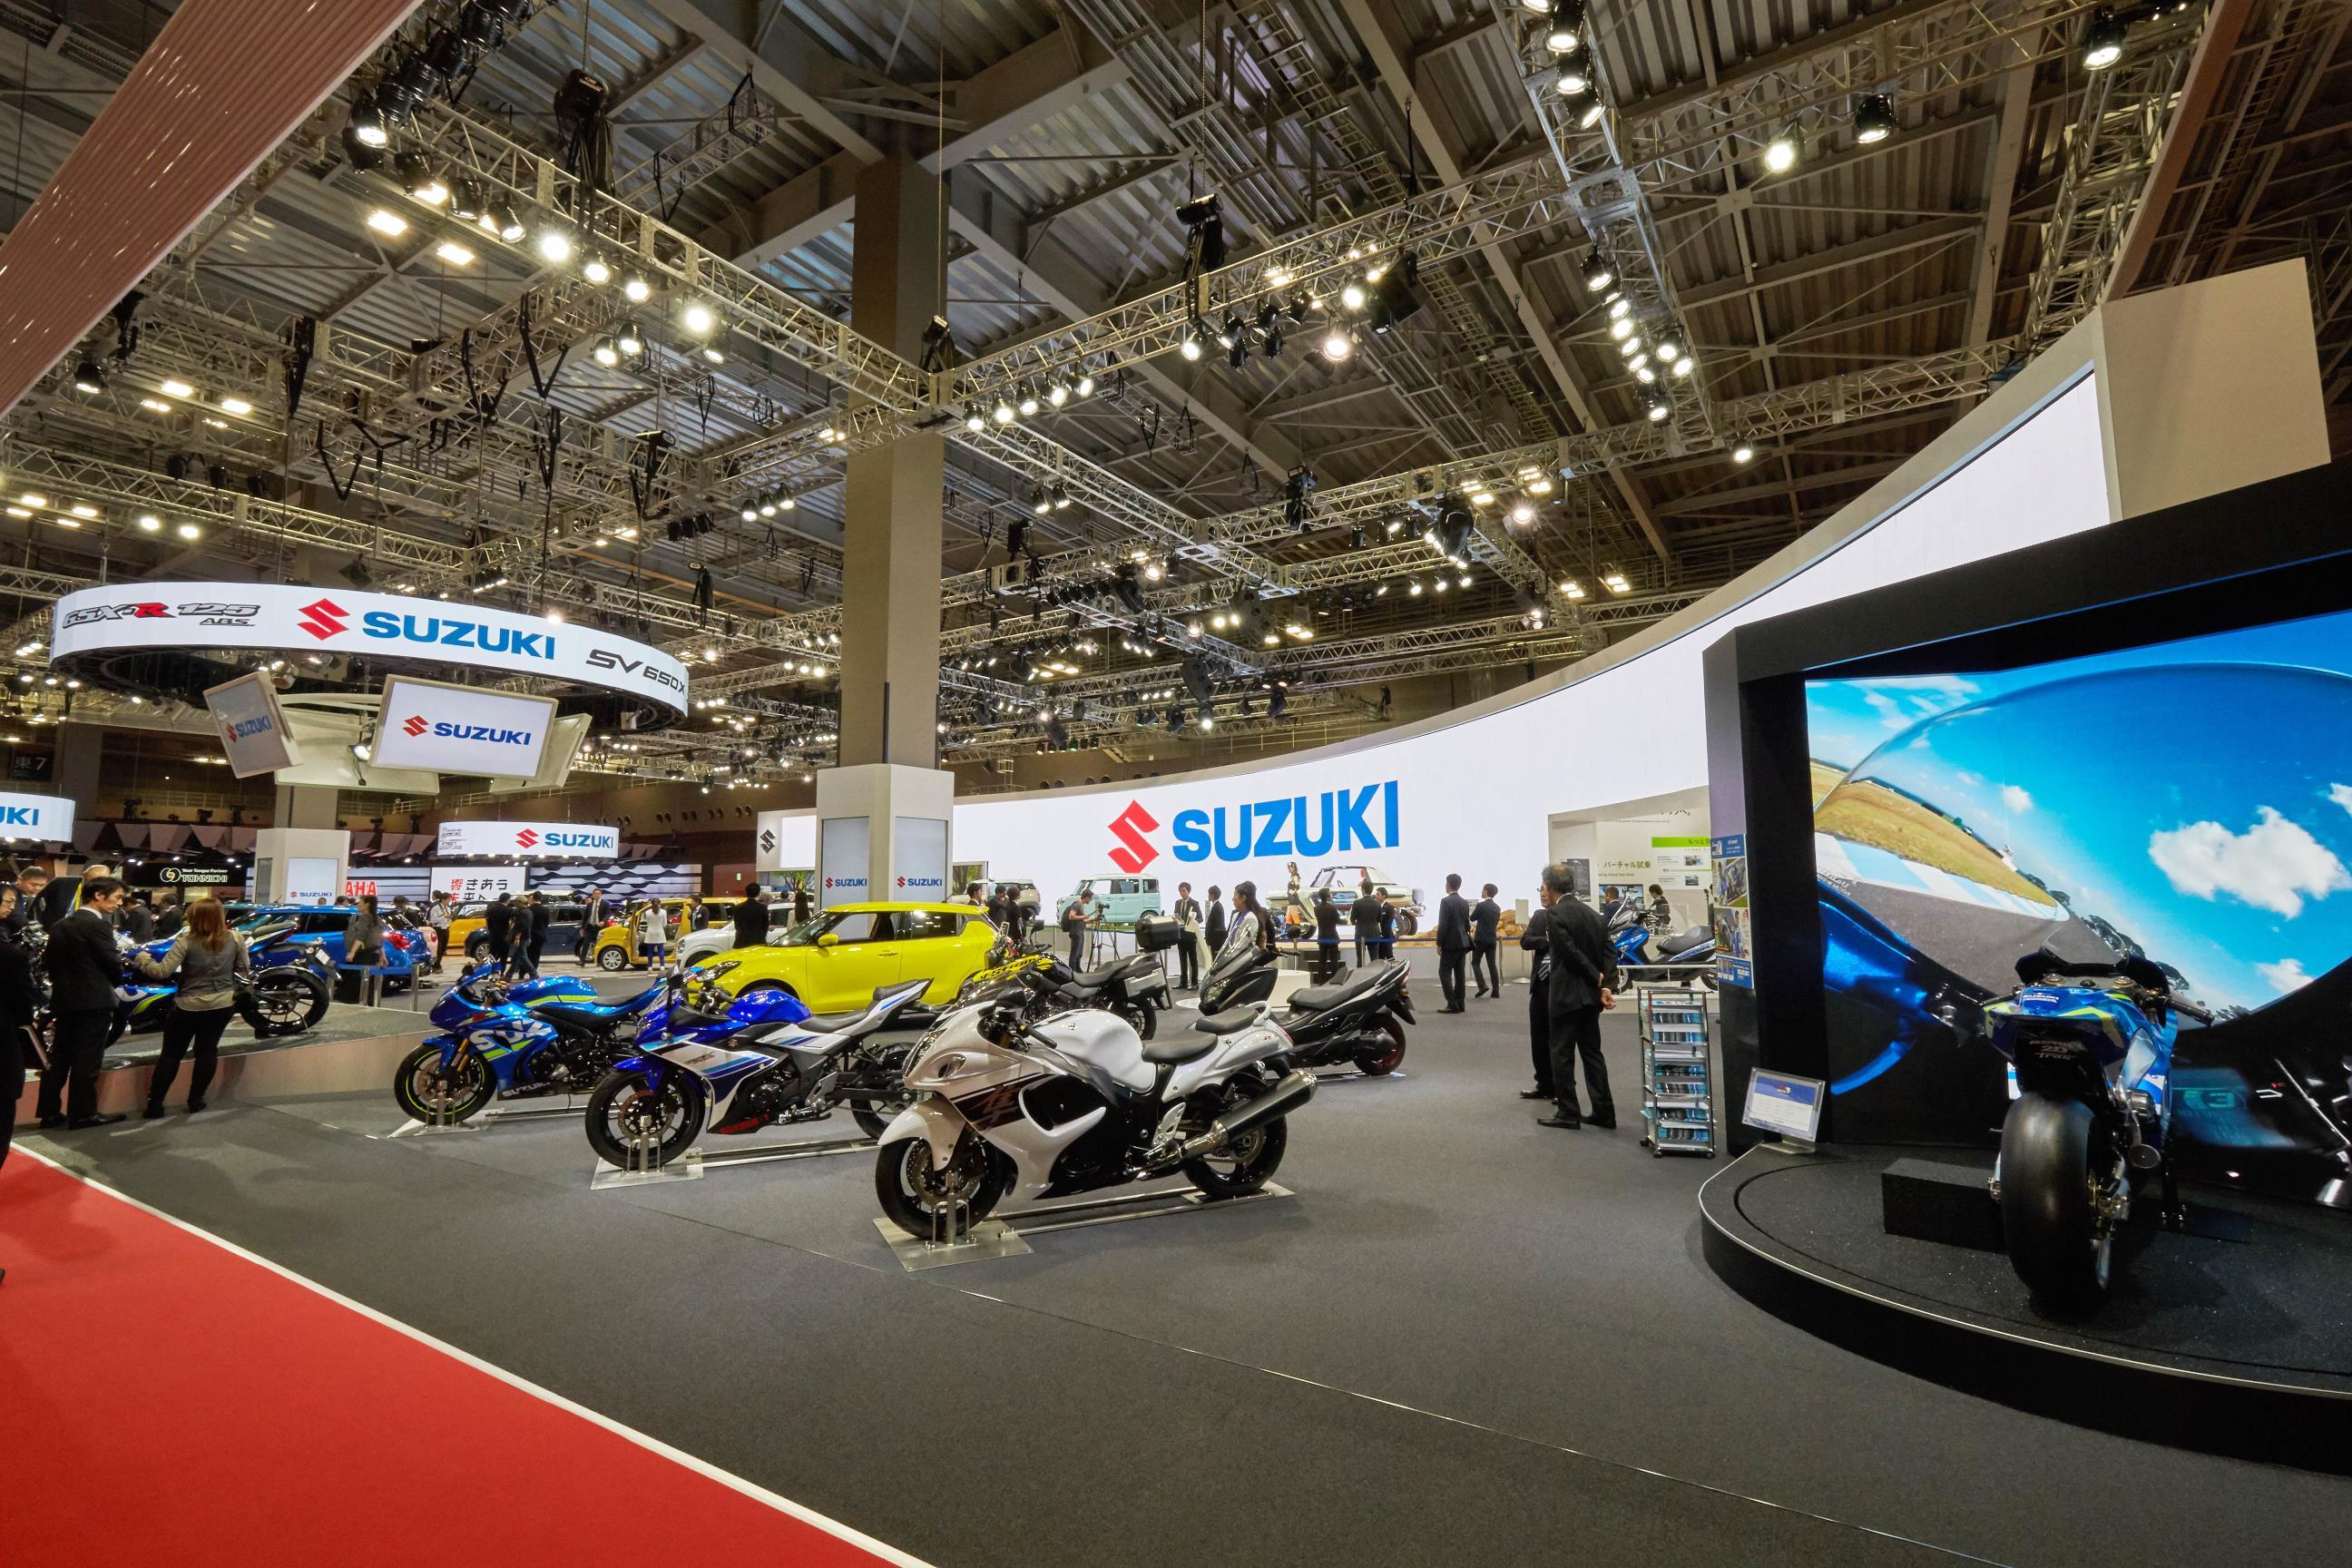 Tokyo motor show 2017 (337)